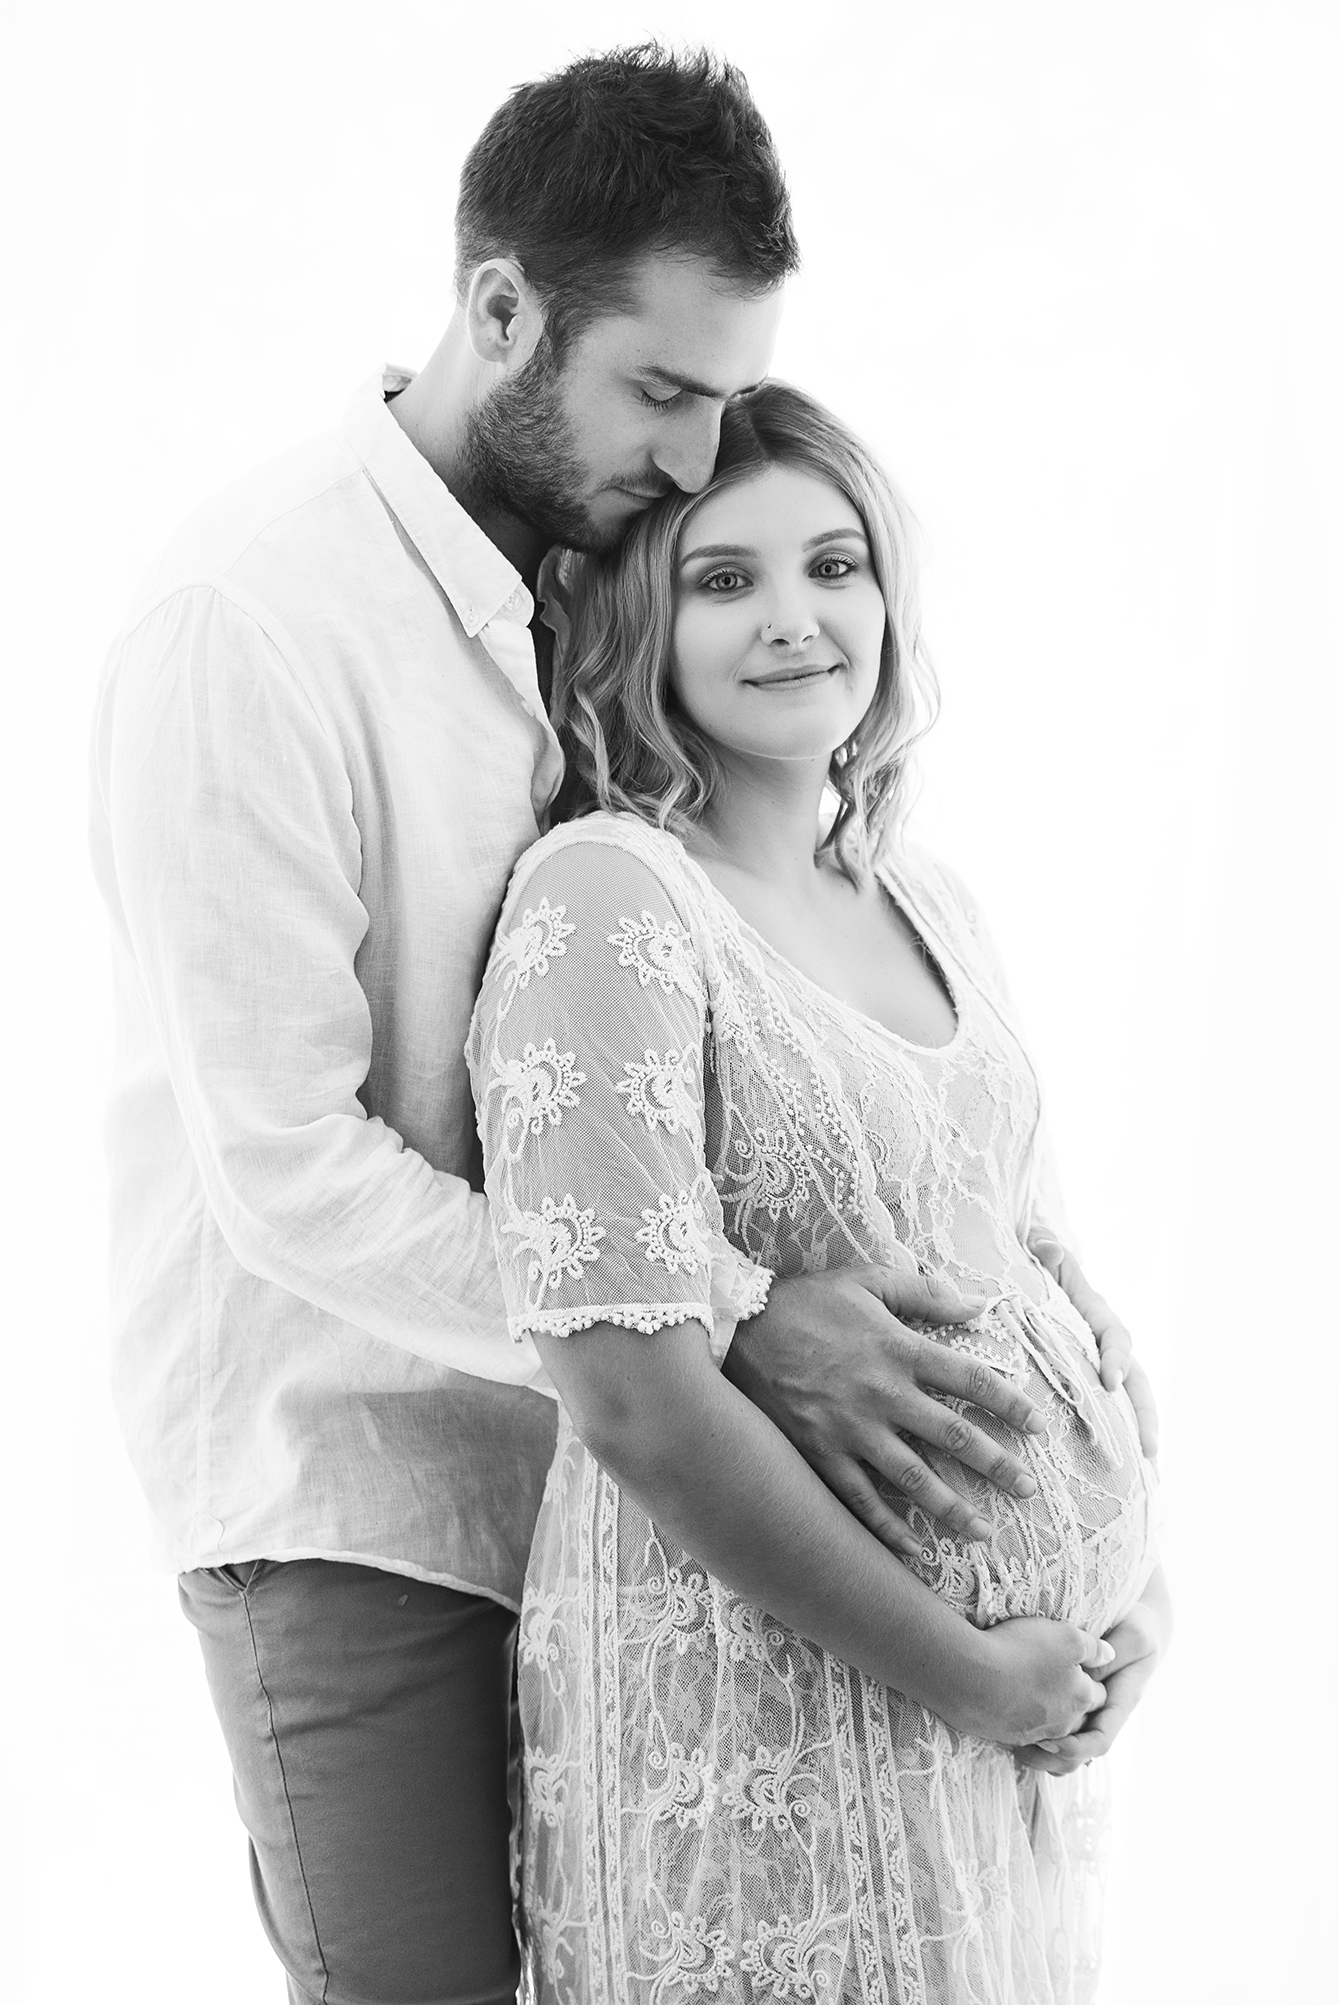 jess maternity10 bw.jpg